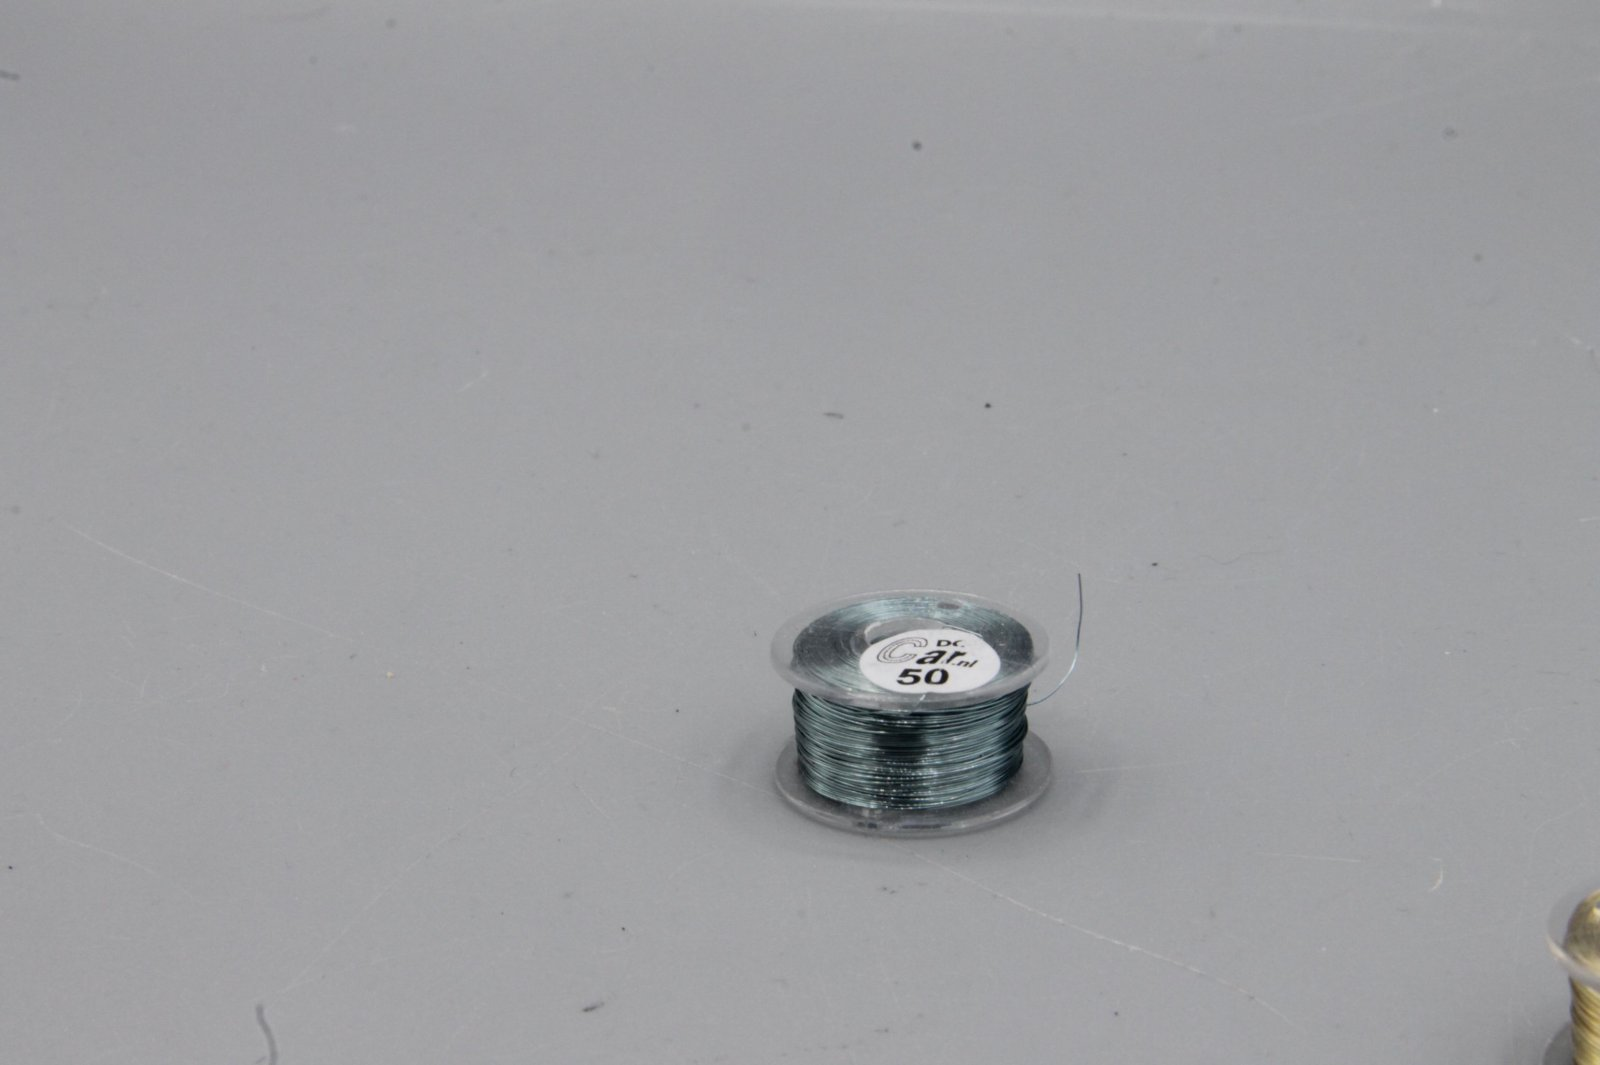 50 m Kupferlackdraht grau 0,15 mm Lackdraht Cu-Draht auf 50m-Spule